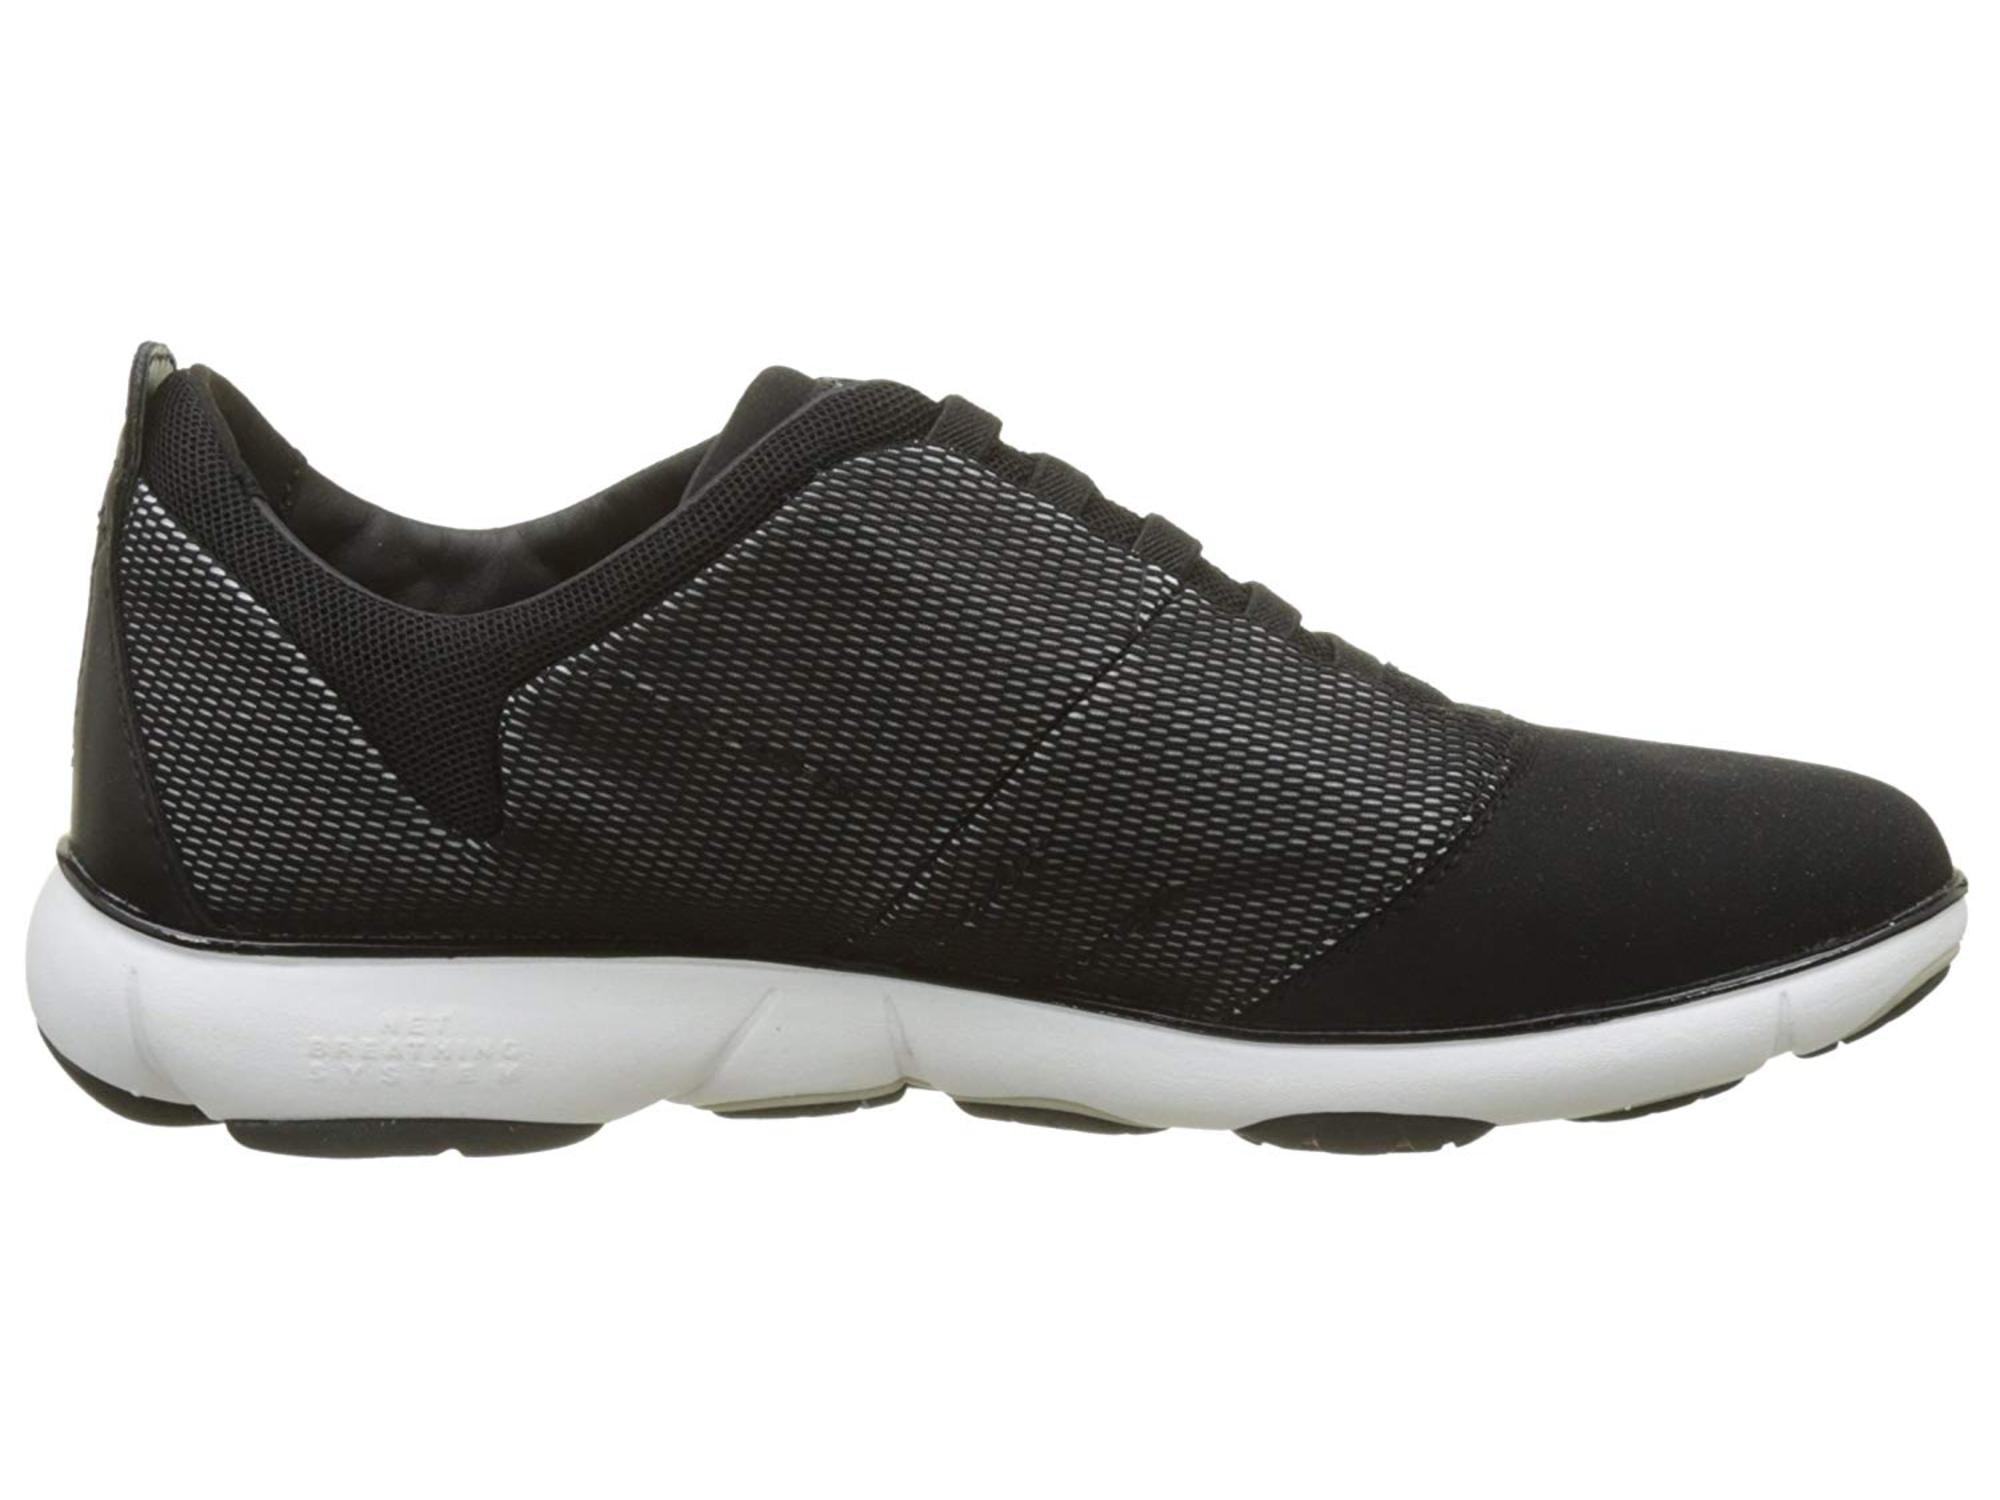 Geox Womens Nebula 16 Sneaker Low Top Bungee Fashion Sneakers